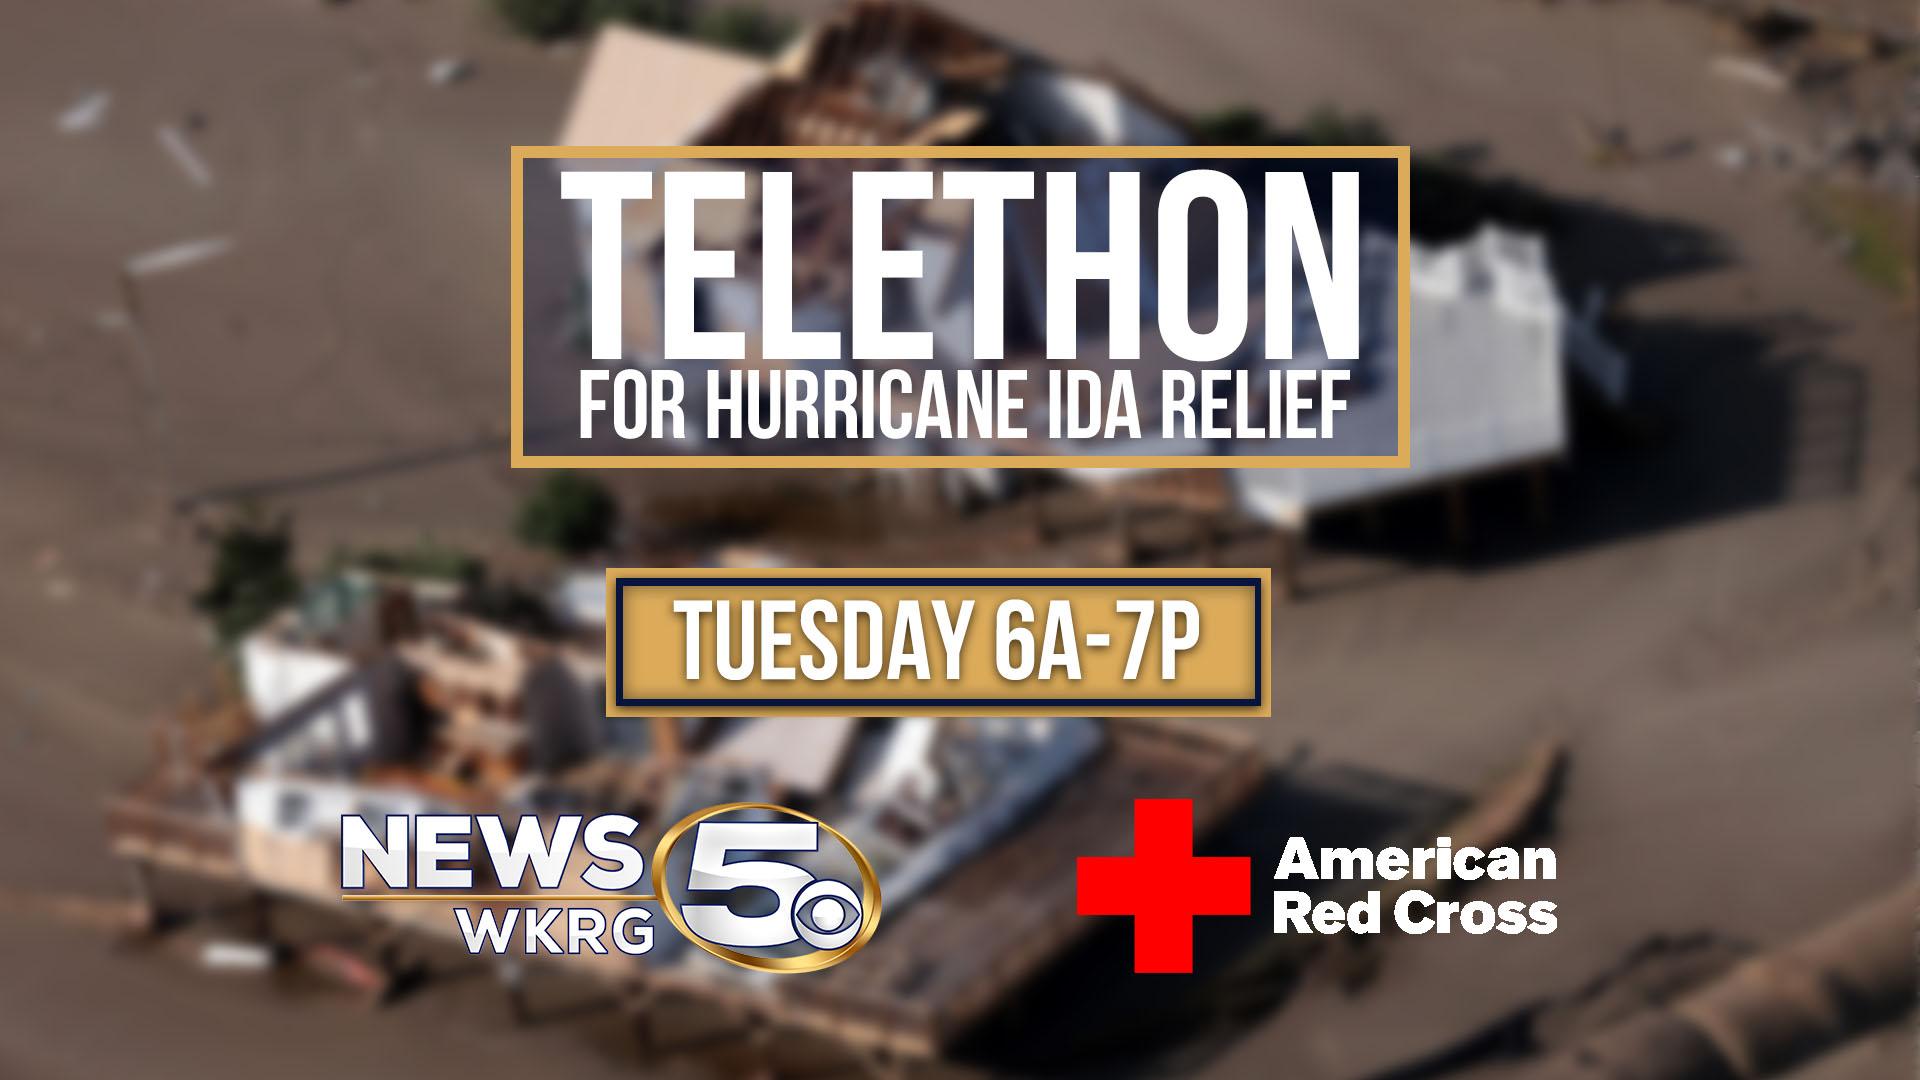 Hurricane Ida telethon WordPress post graphic